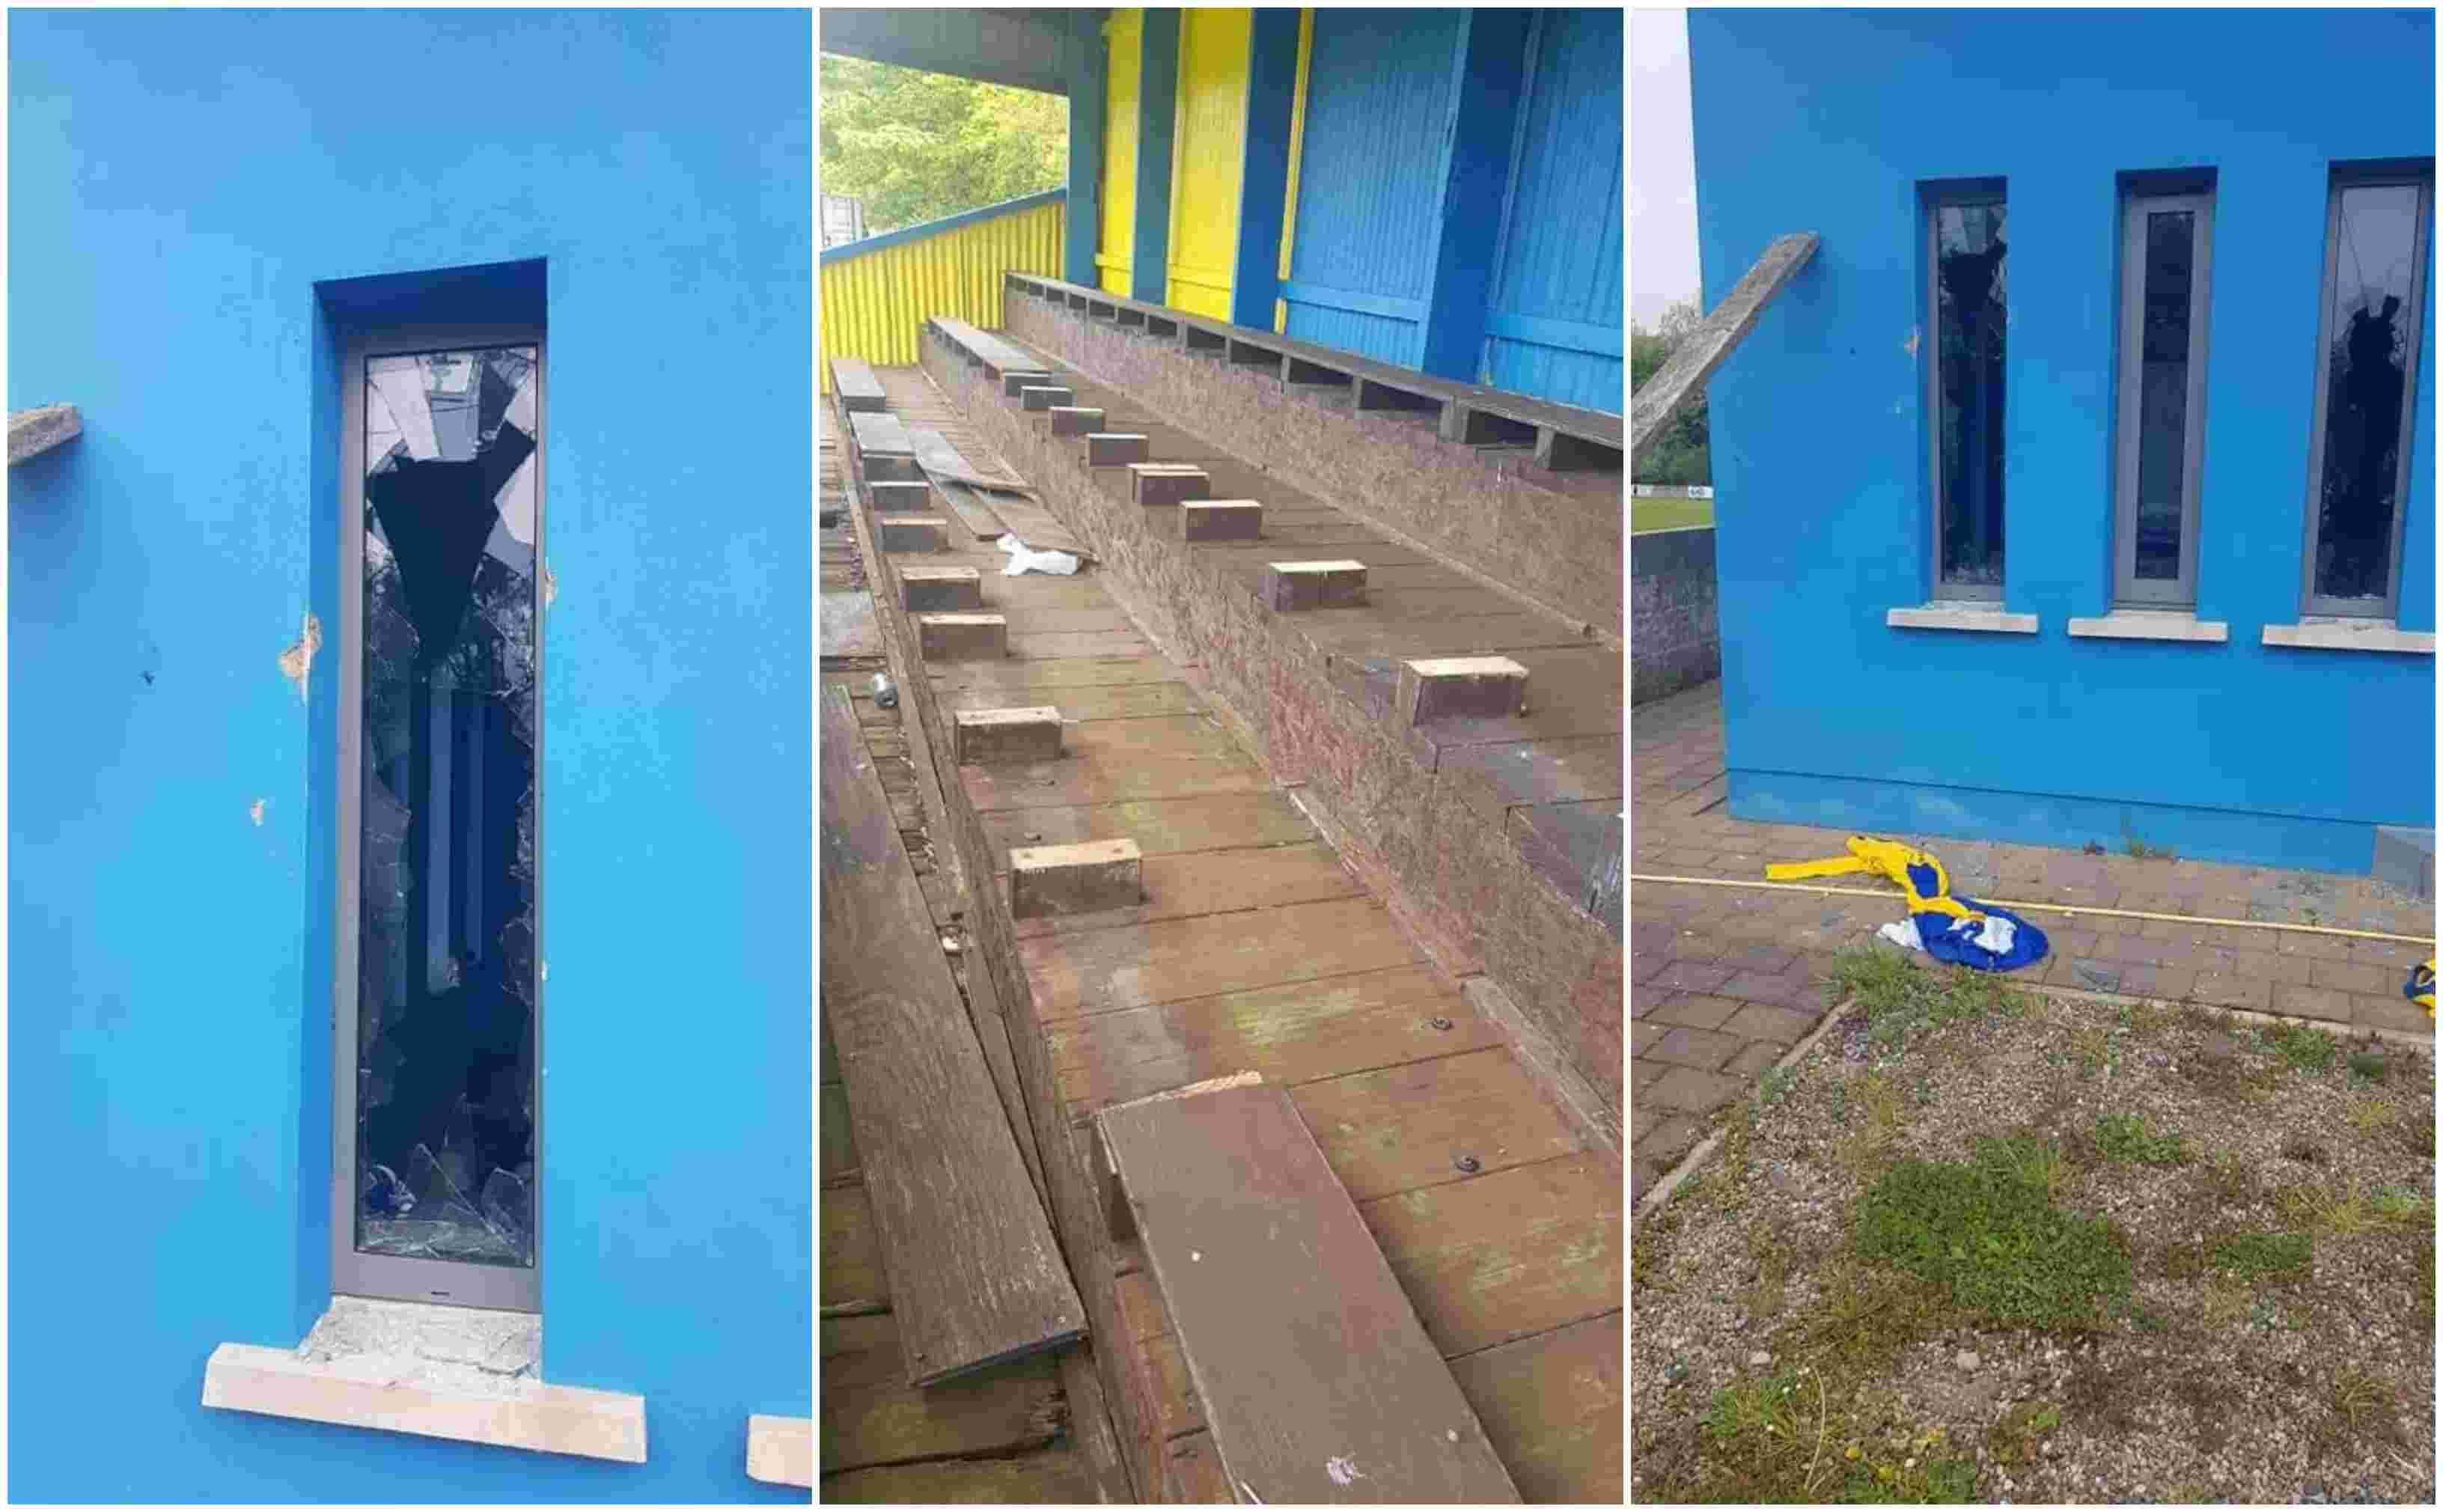 AFC Craigavon vandalised